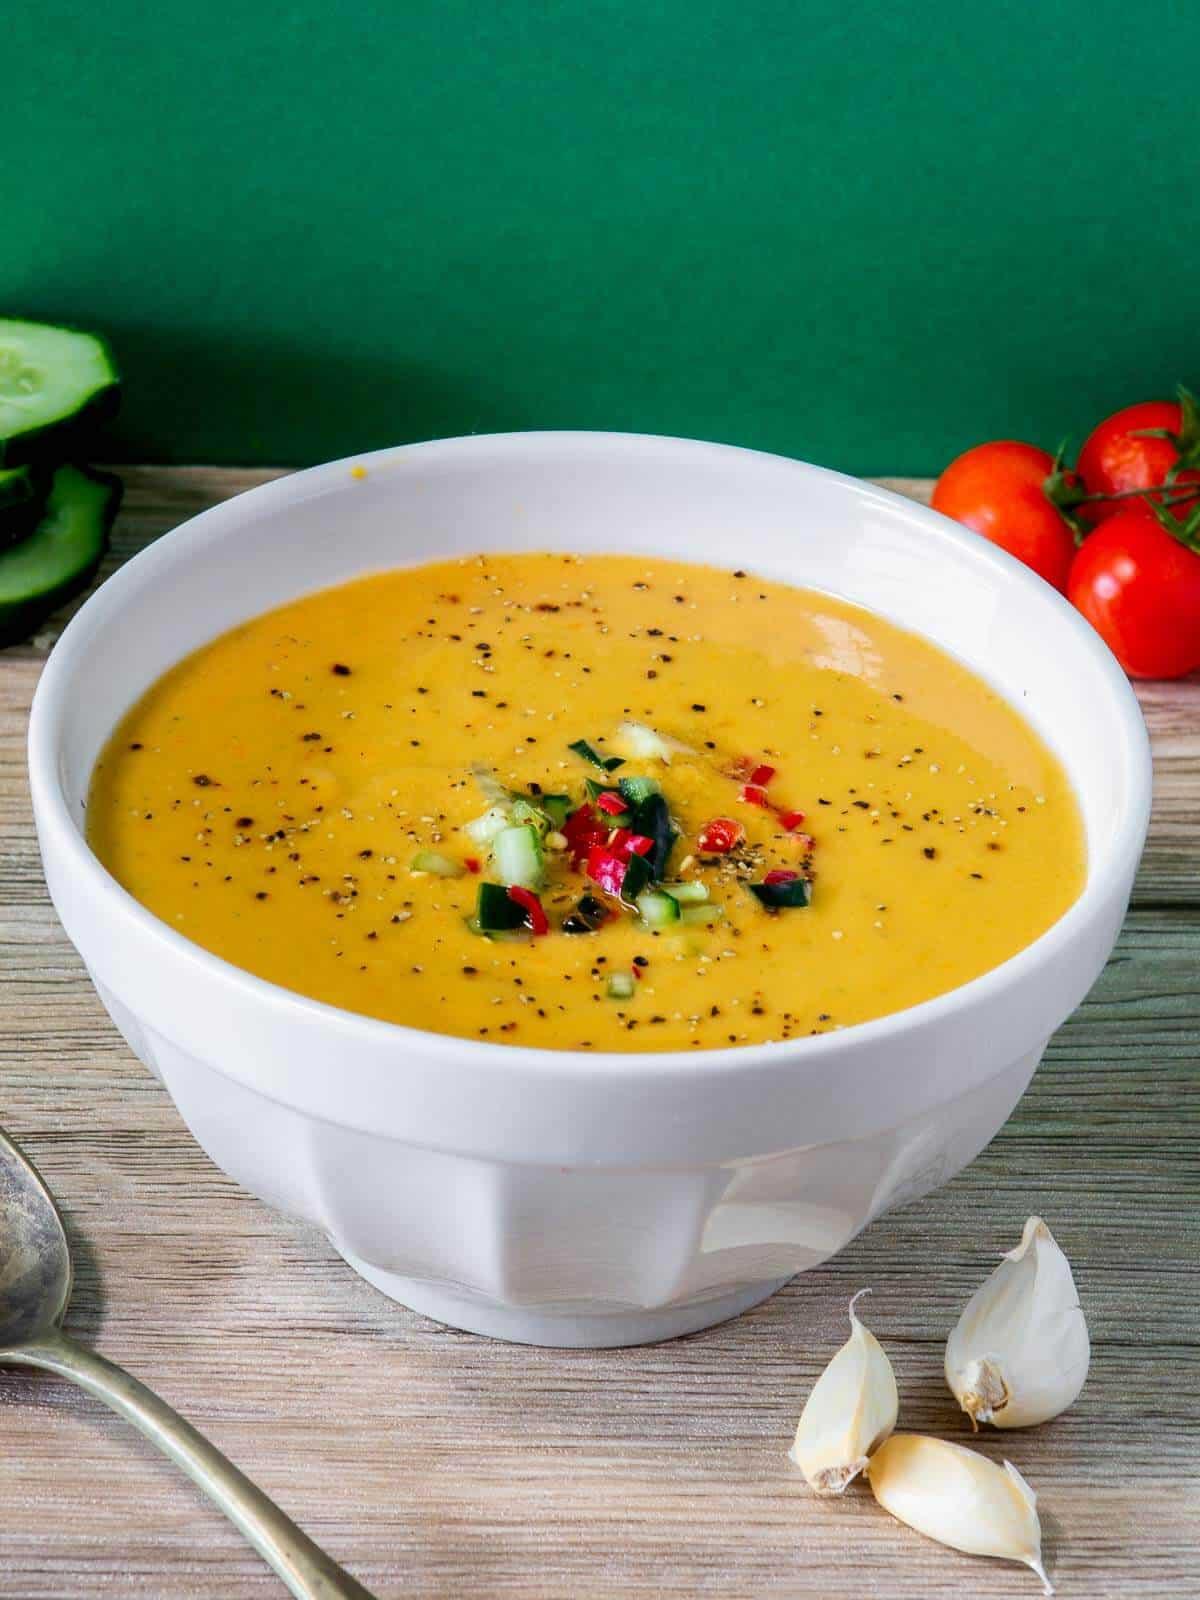 Garnished Gazpacho in bowl